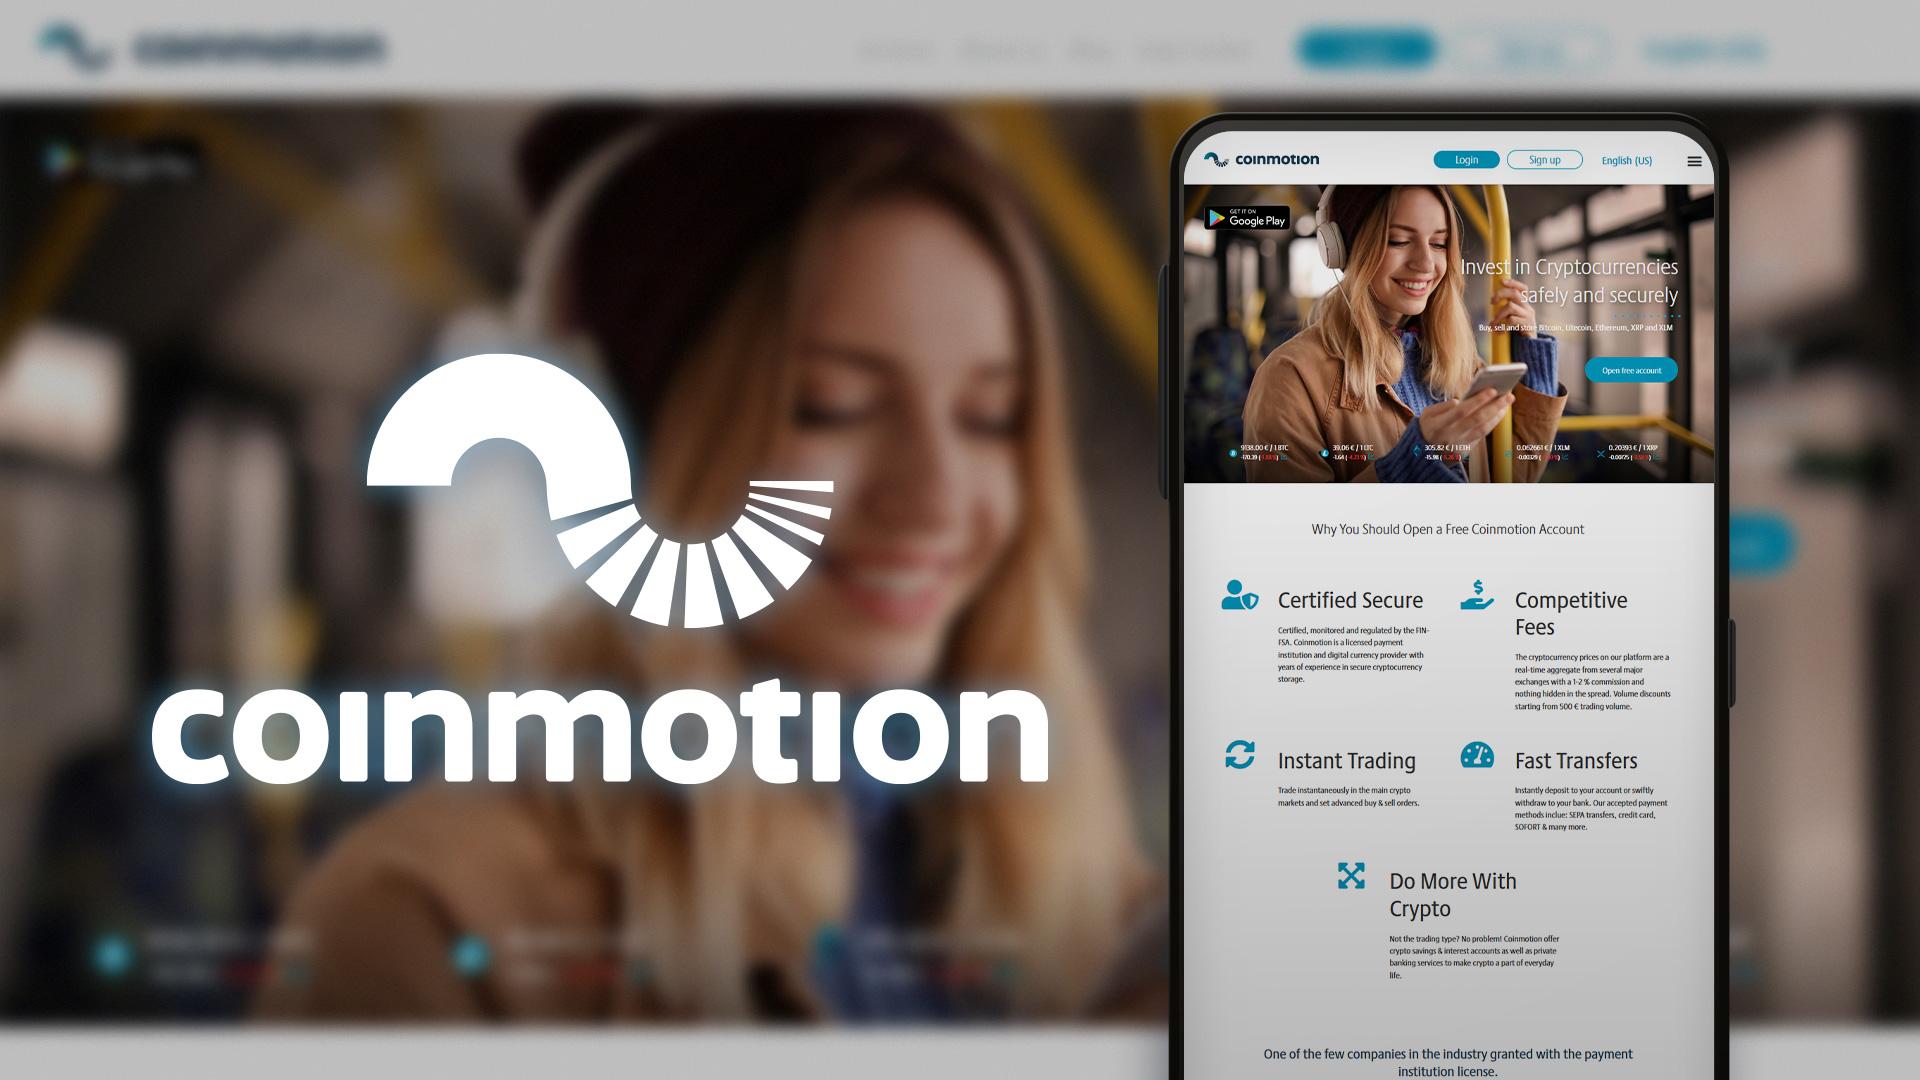 coinmotion_update-3